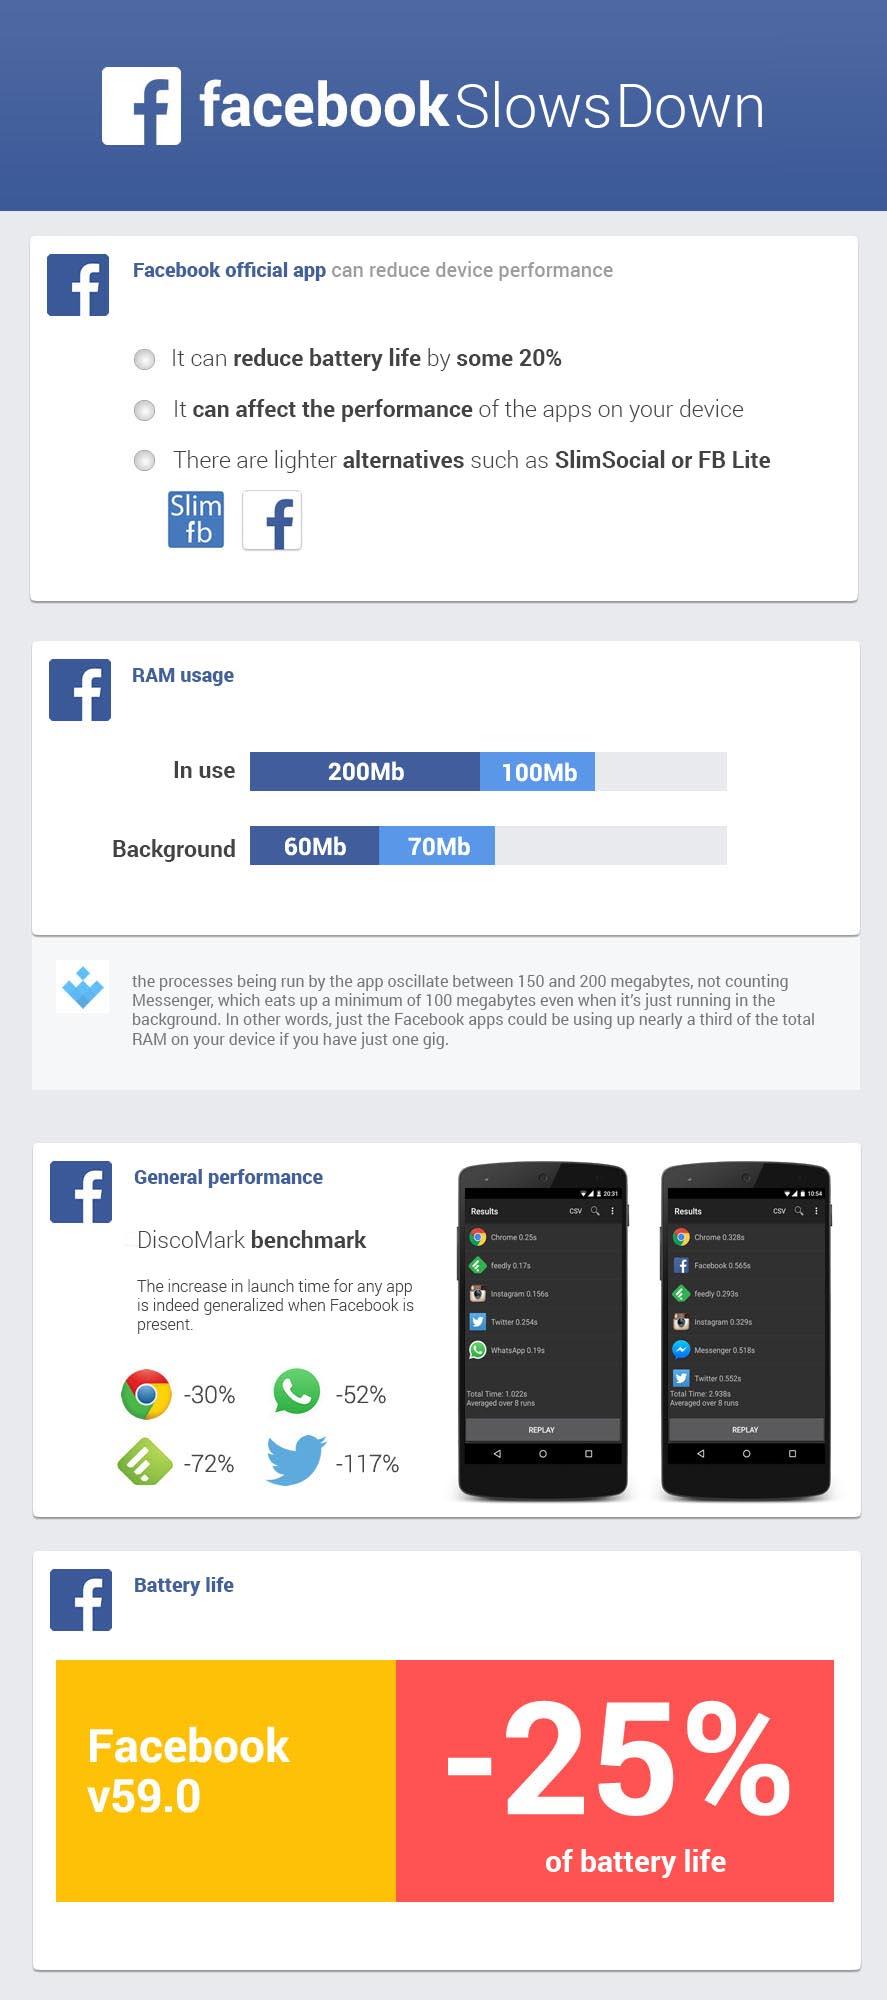 facebook-slows-down-en